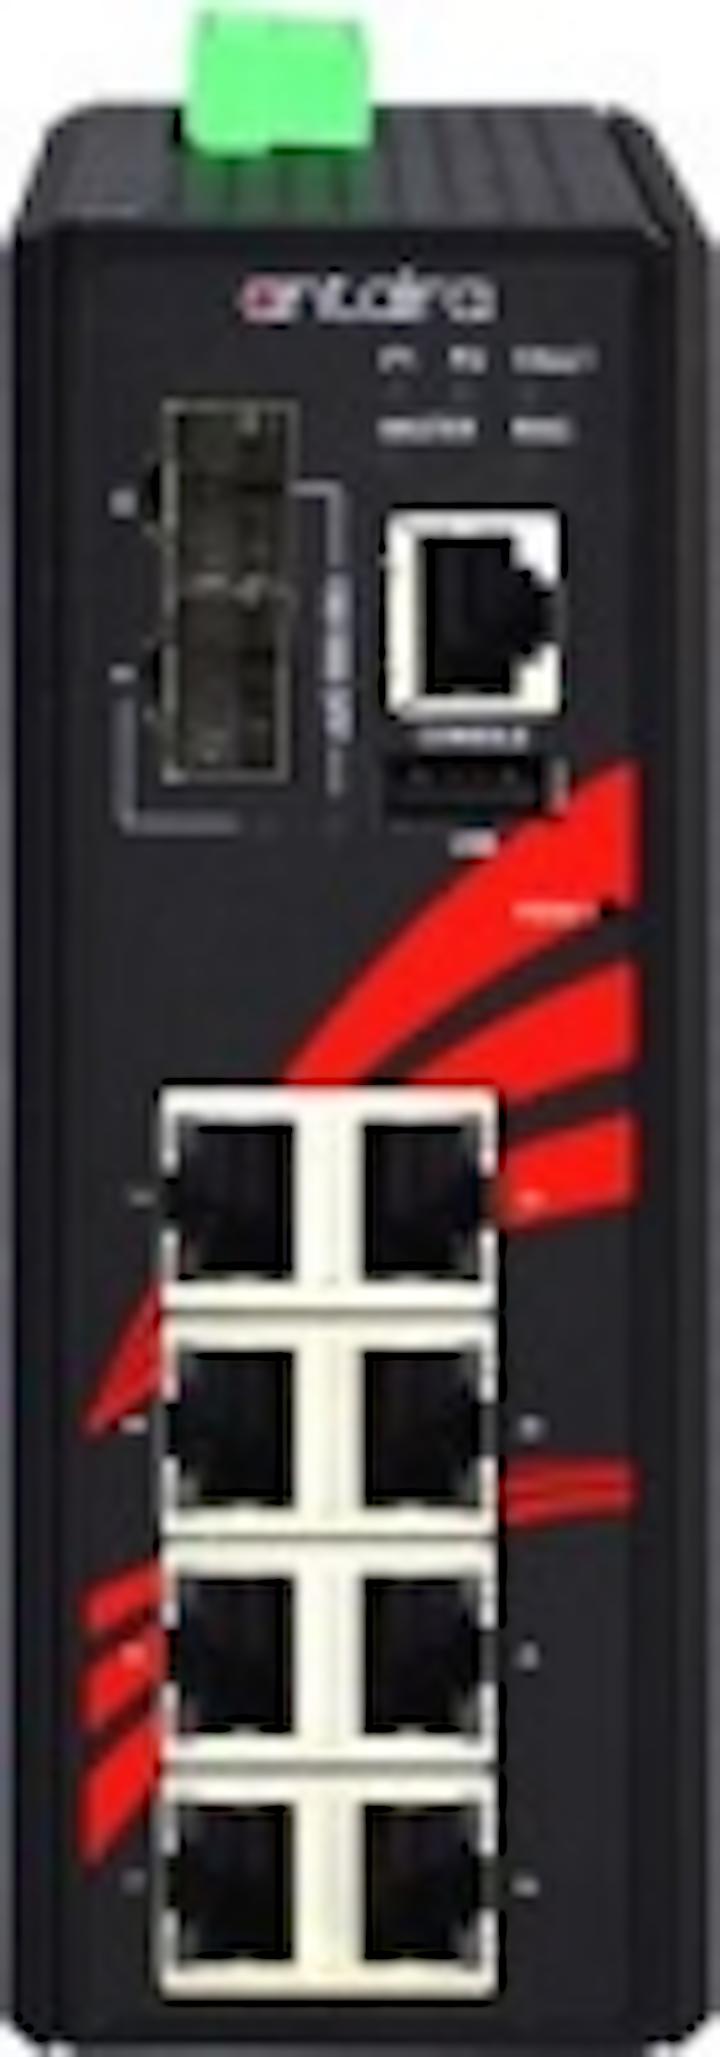 Content Dam Vsd En Articles 2015 09 Industrial Poe Managed Ethernet Switches Feature 10 Ports Leftcolumn Article Thumbnailimage File